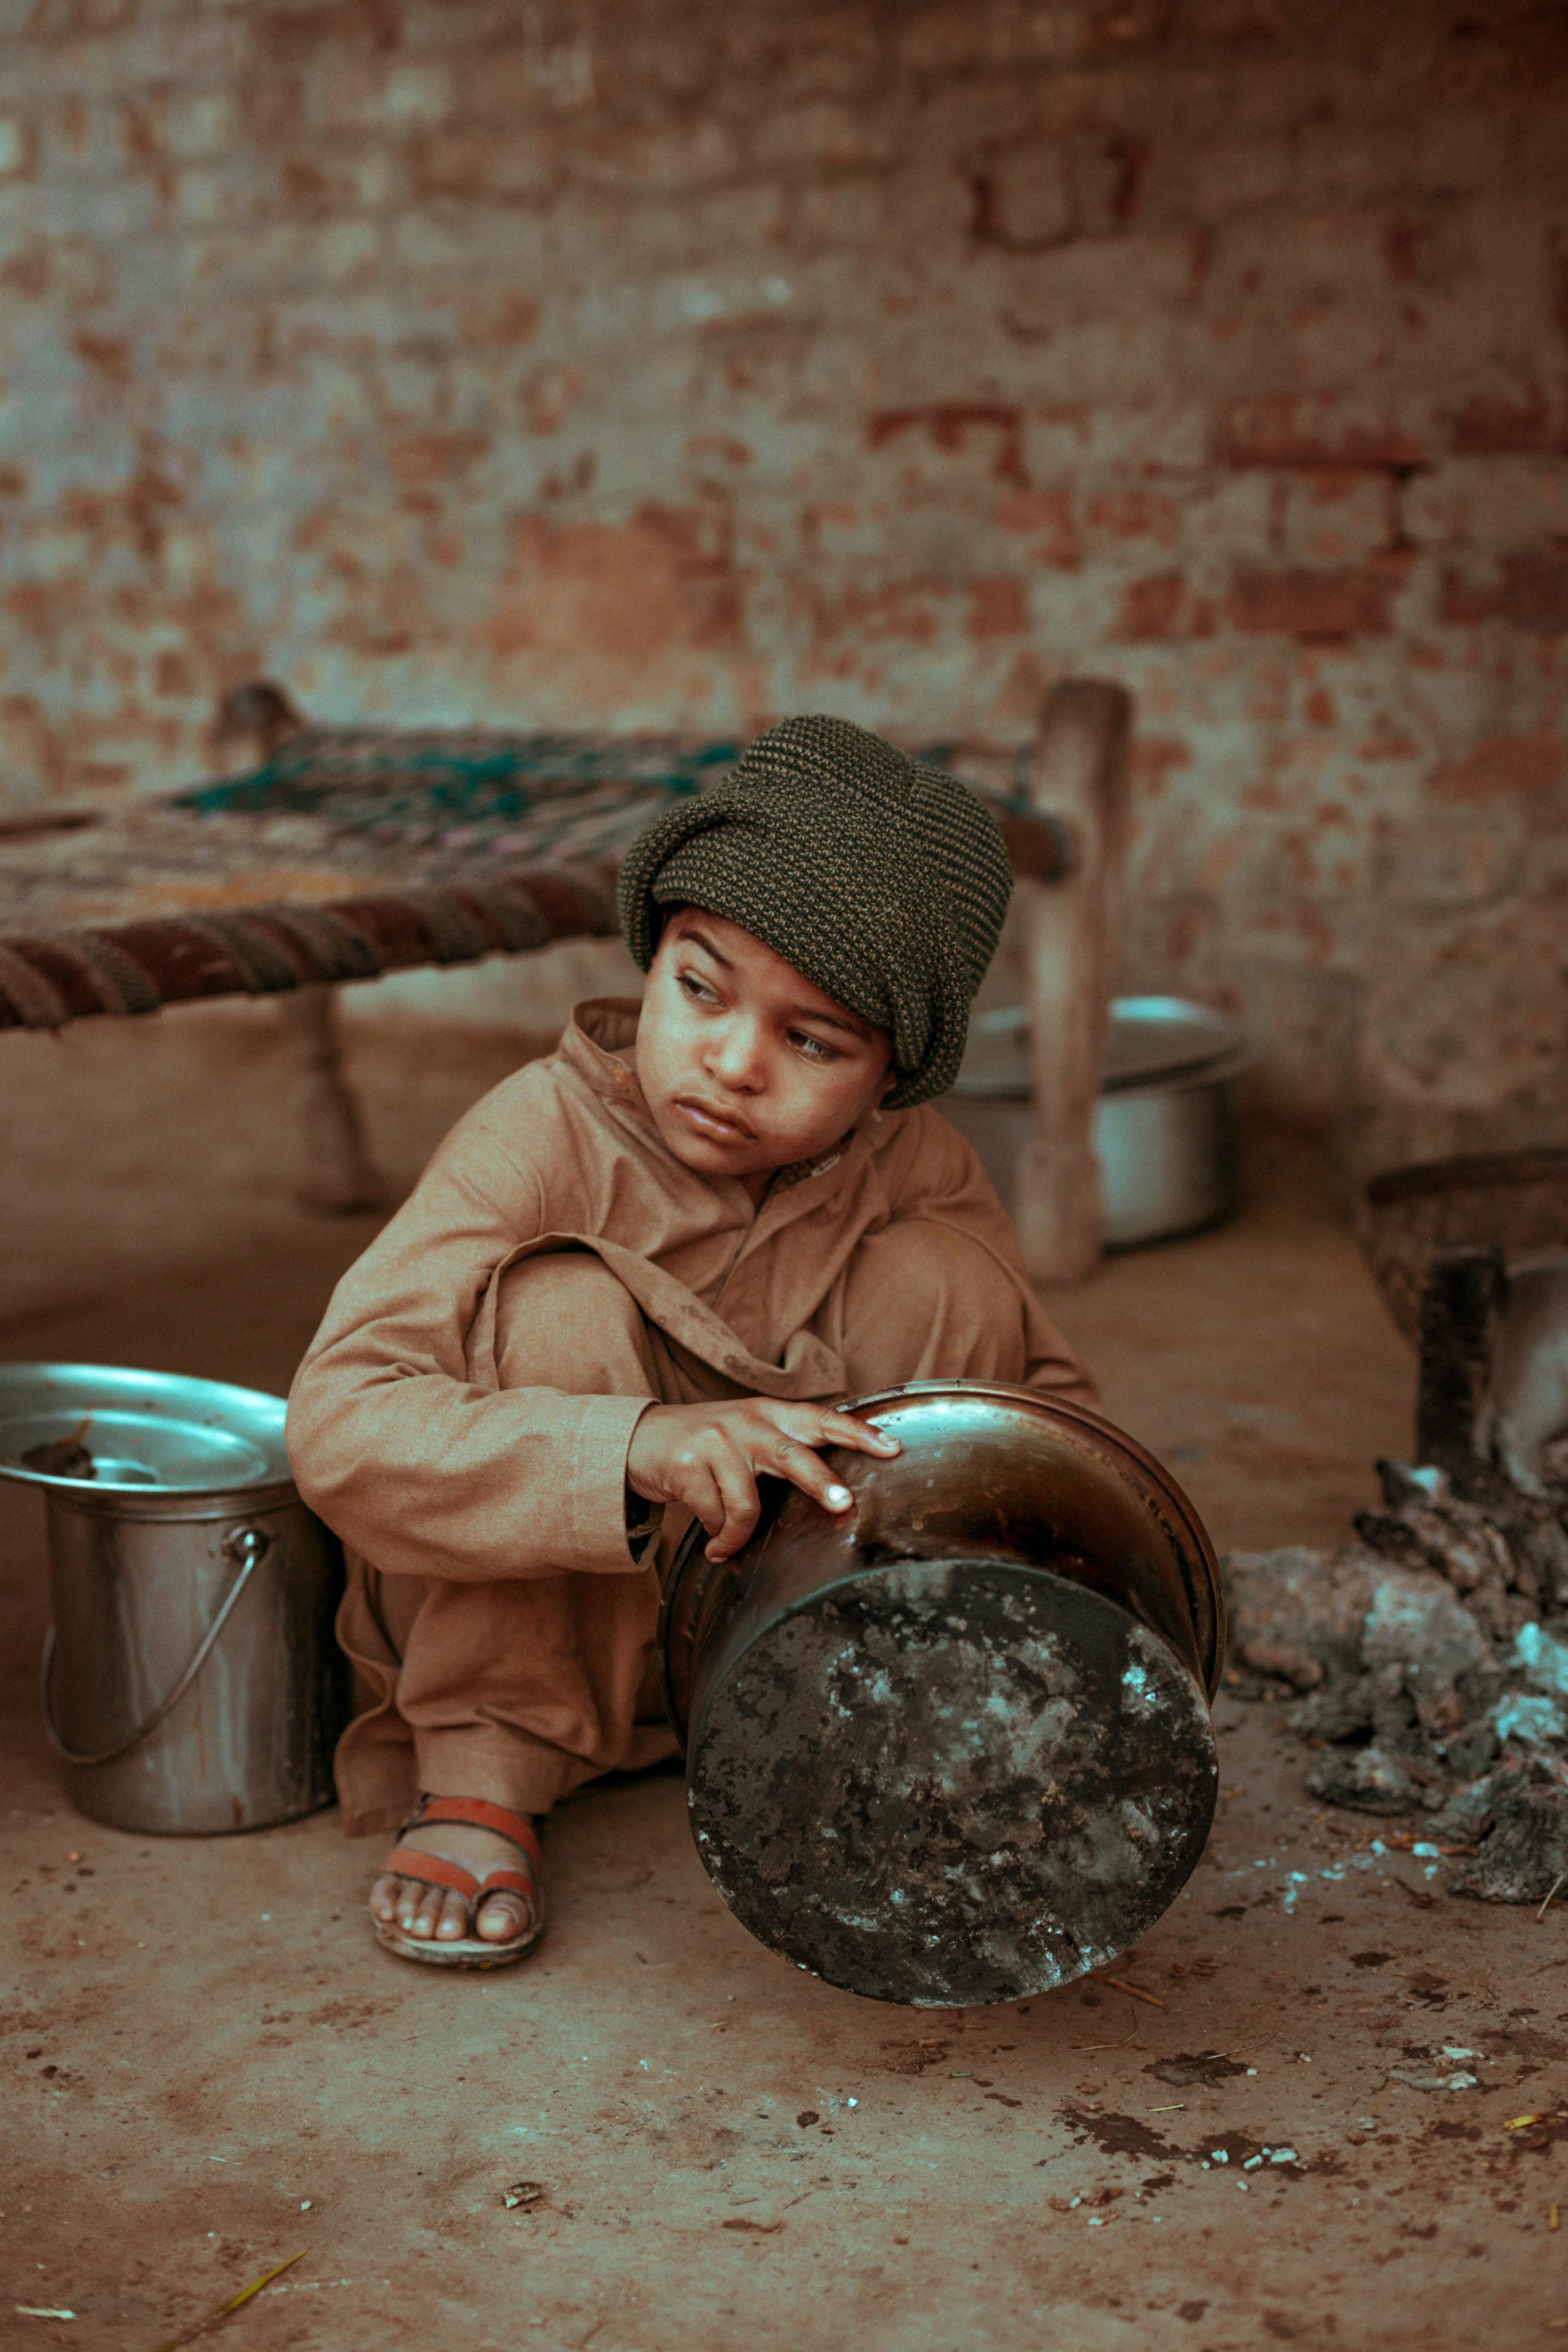 Photo by Muhammad Muzamil on Unsplash